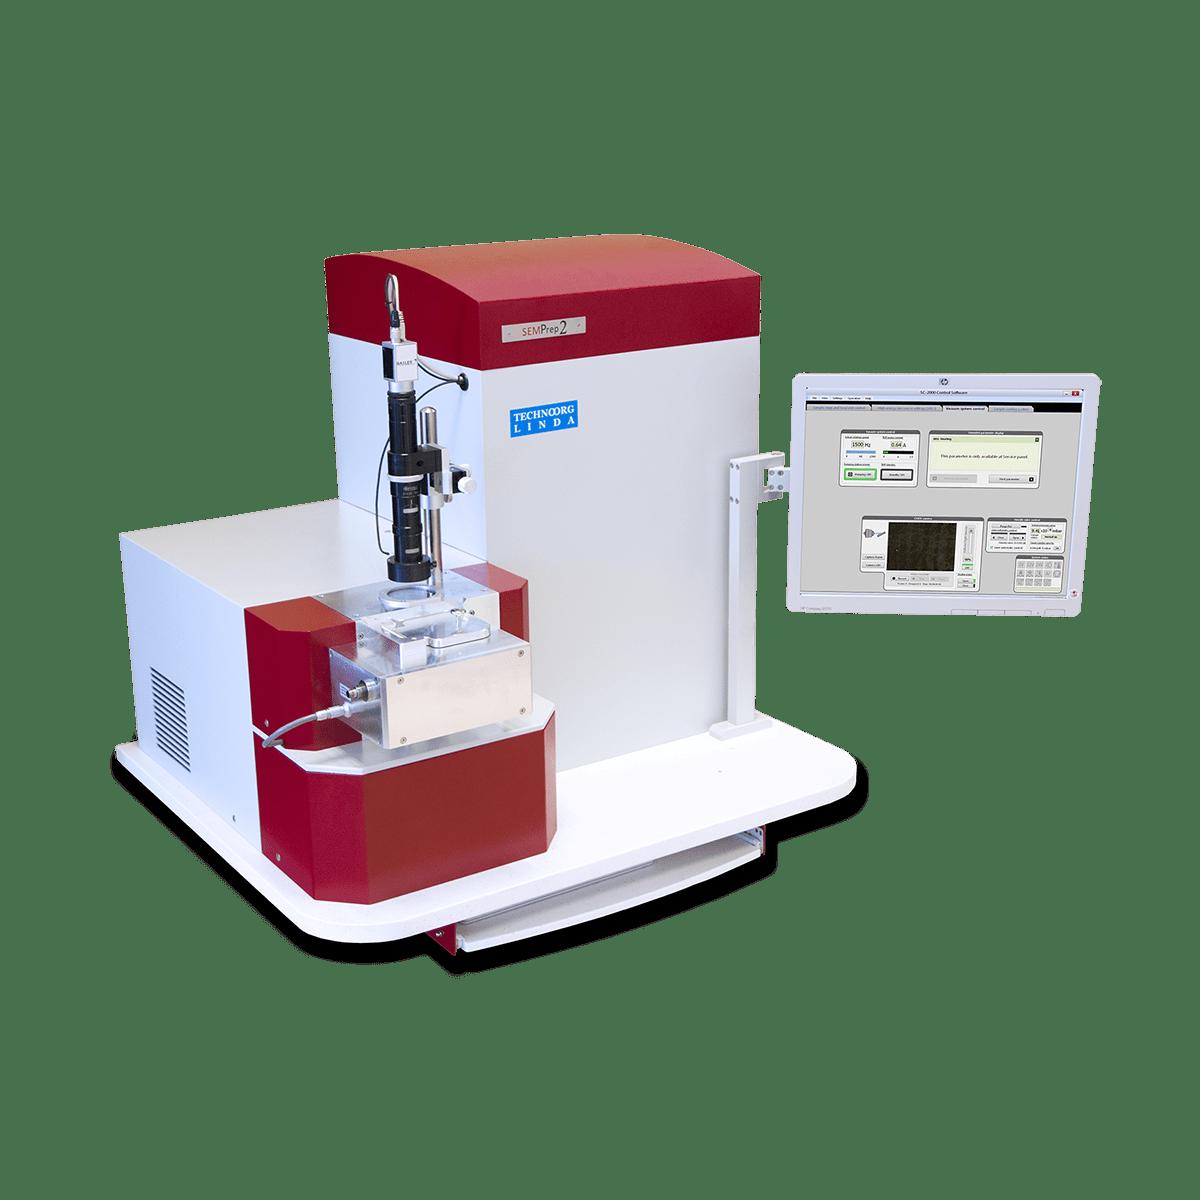 KCT-agent-technoorg-linda-ion-milling-system-SEMPrep2-SC-2100